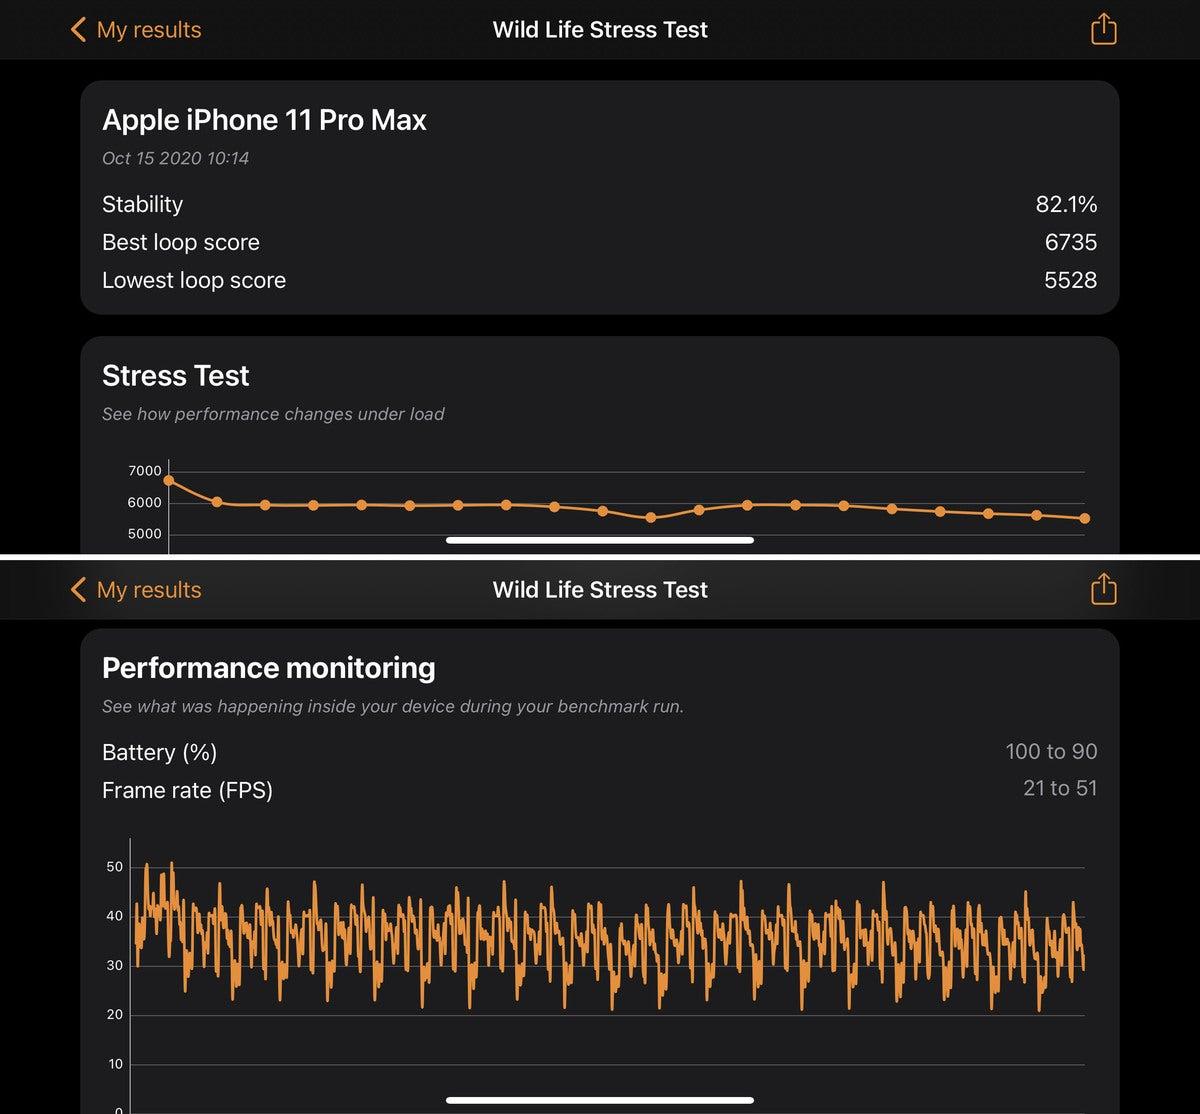 3dmark stress results